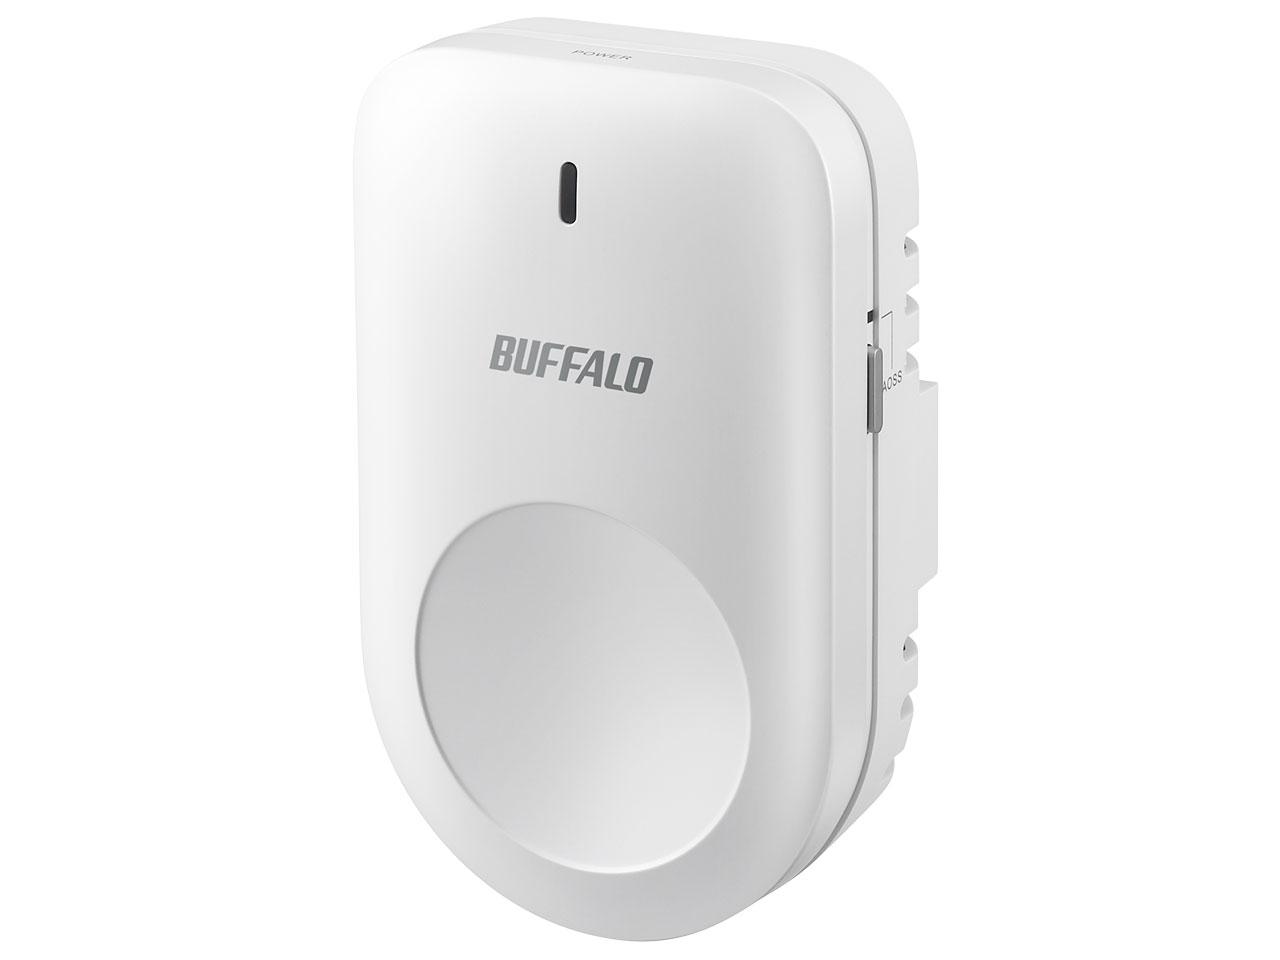 BUFFALO AirStation connect WEM-1266WP [ホワイト]【お取り寄せ商品(3週間~4週間程度での入荷、発送)】